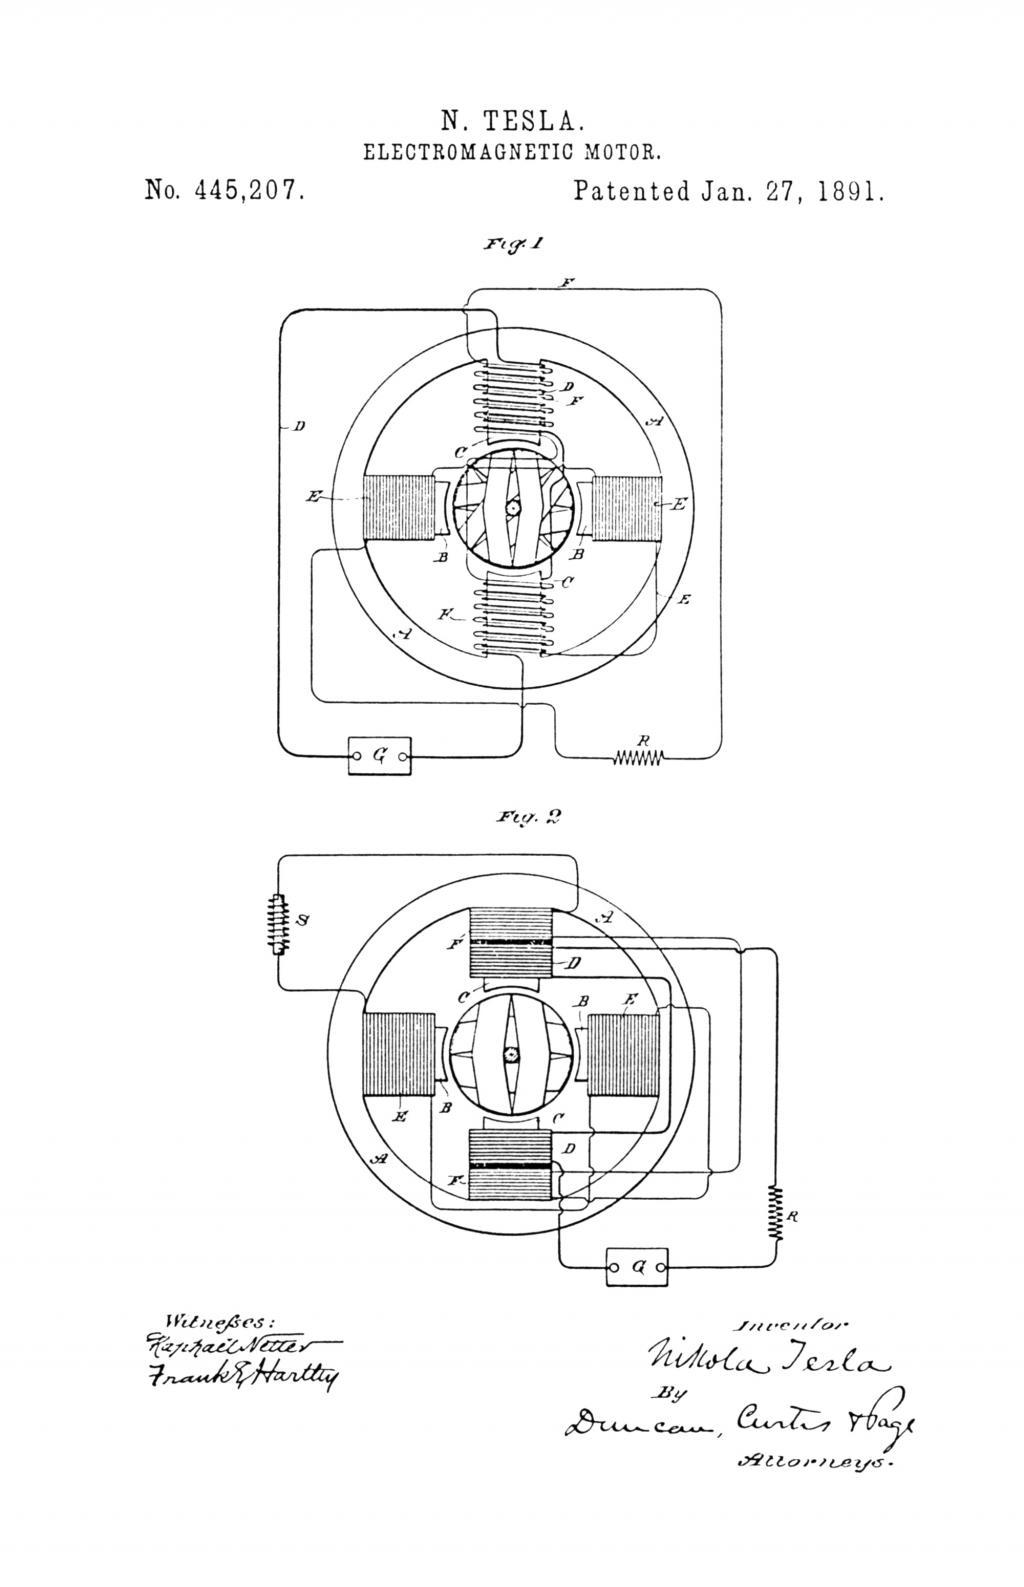 hight resolution of nikola tesla u s patent 445 207 electro magnetic motor